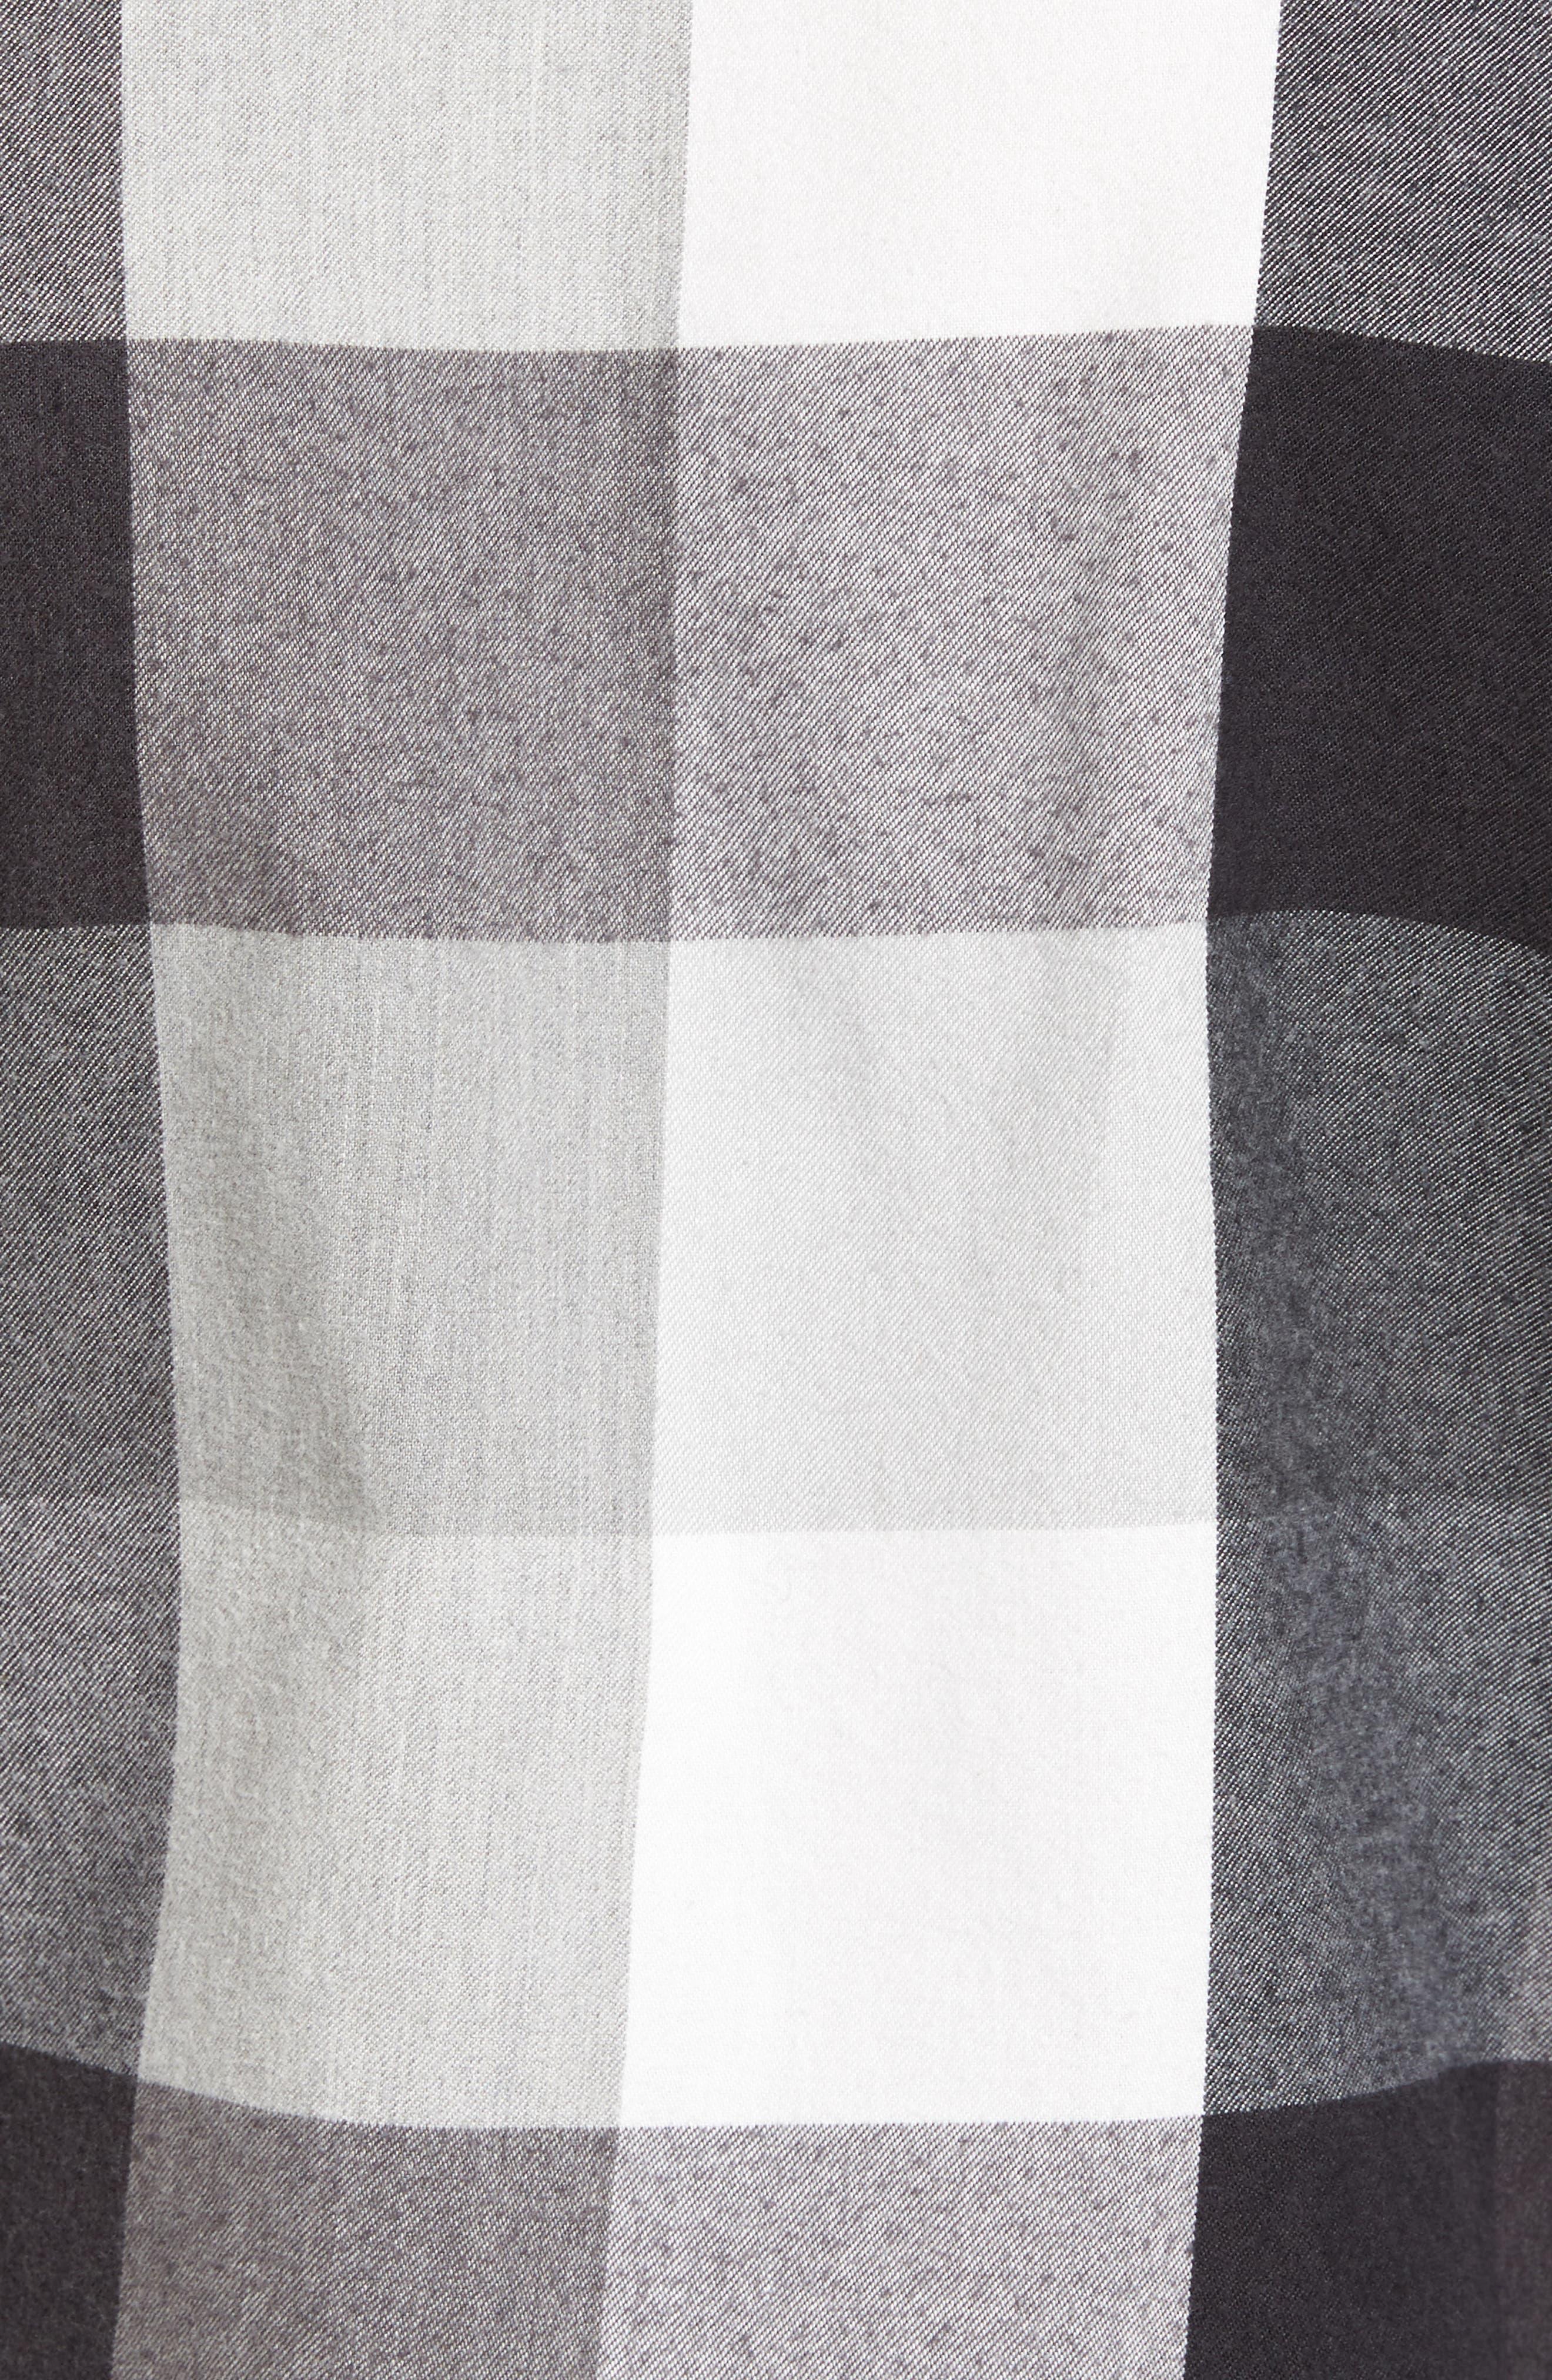 Trim Fit Workwear Check Flannel Shirt,                             Alternate thumbnail 5, color,                             Grey Paloma Buffalo Plaid